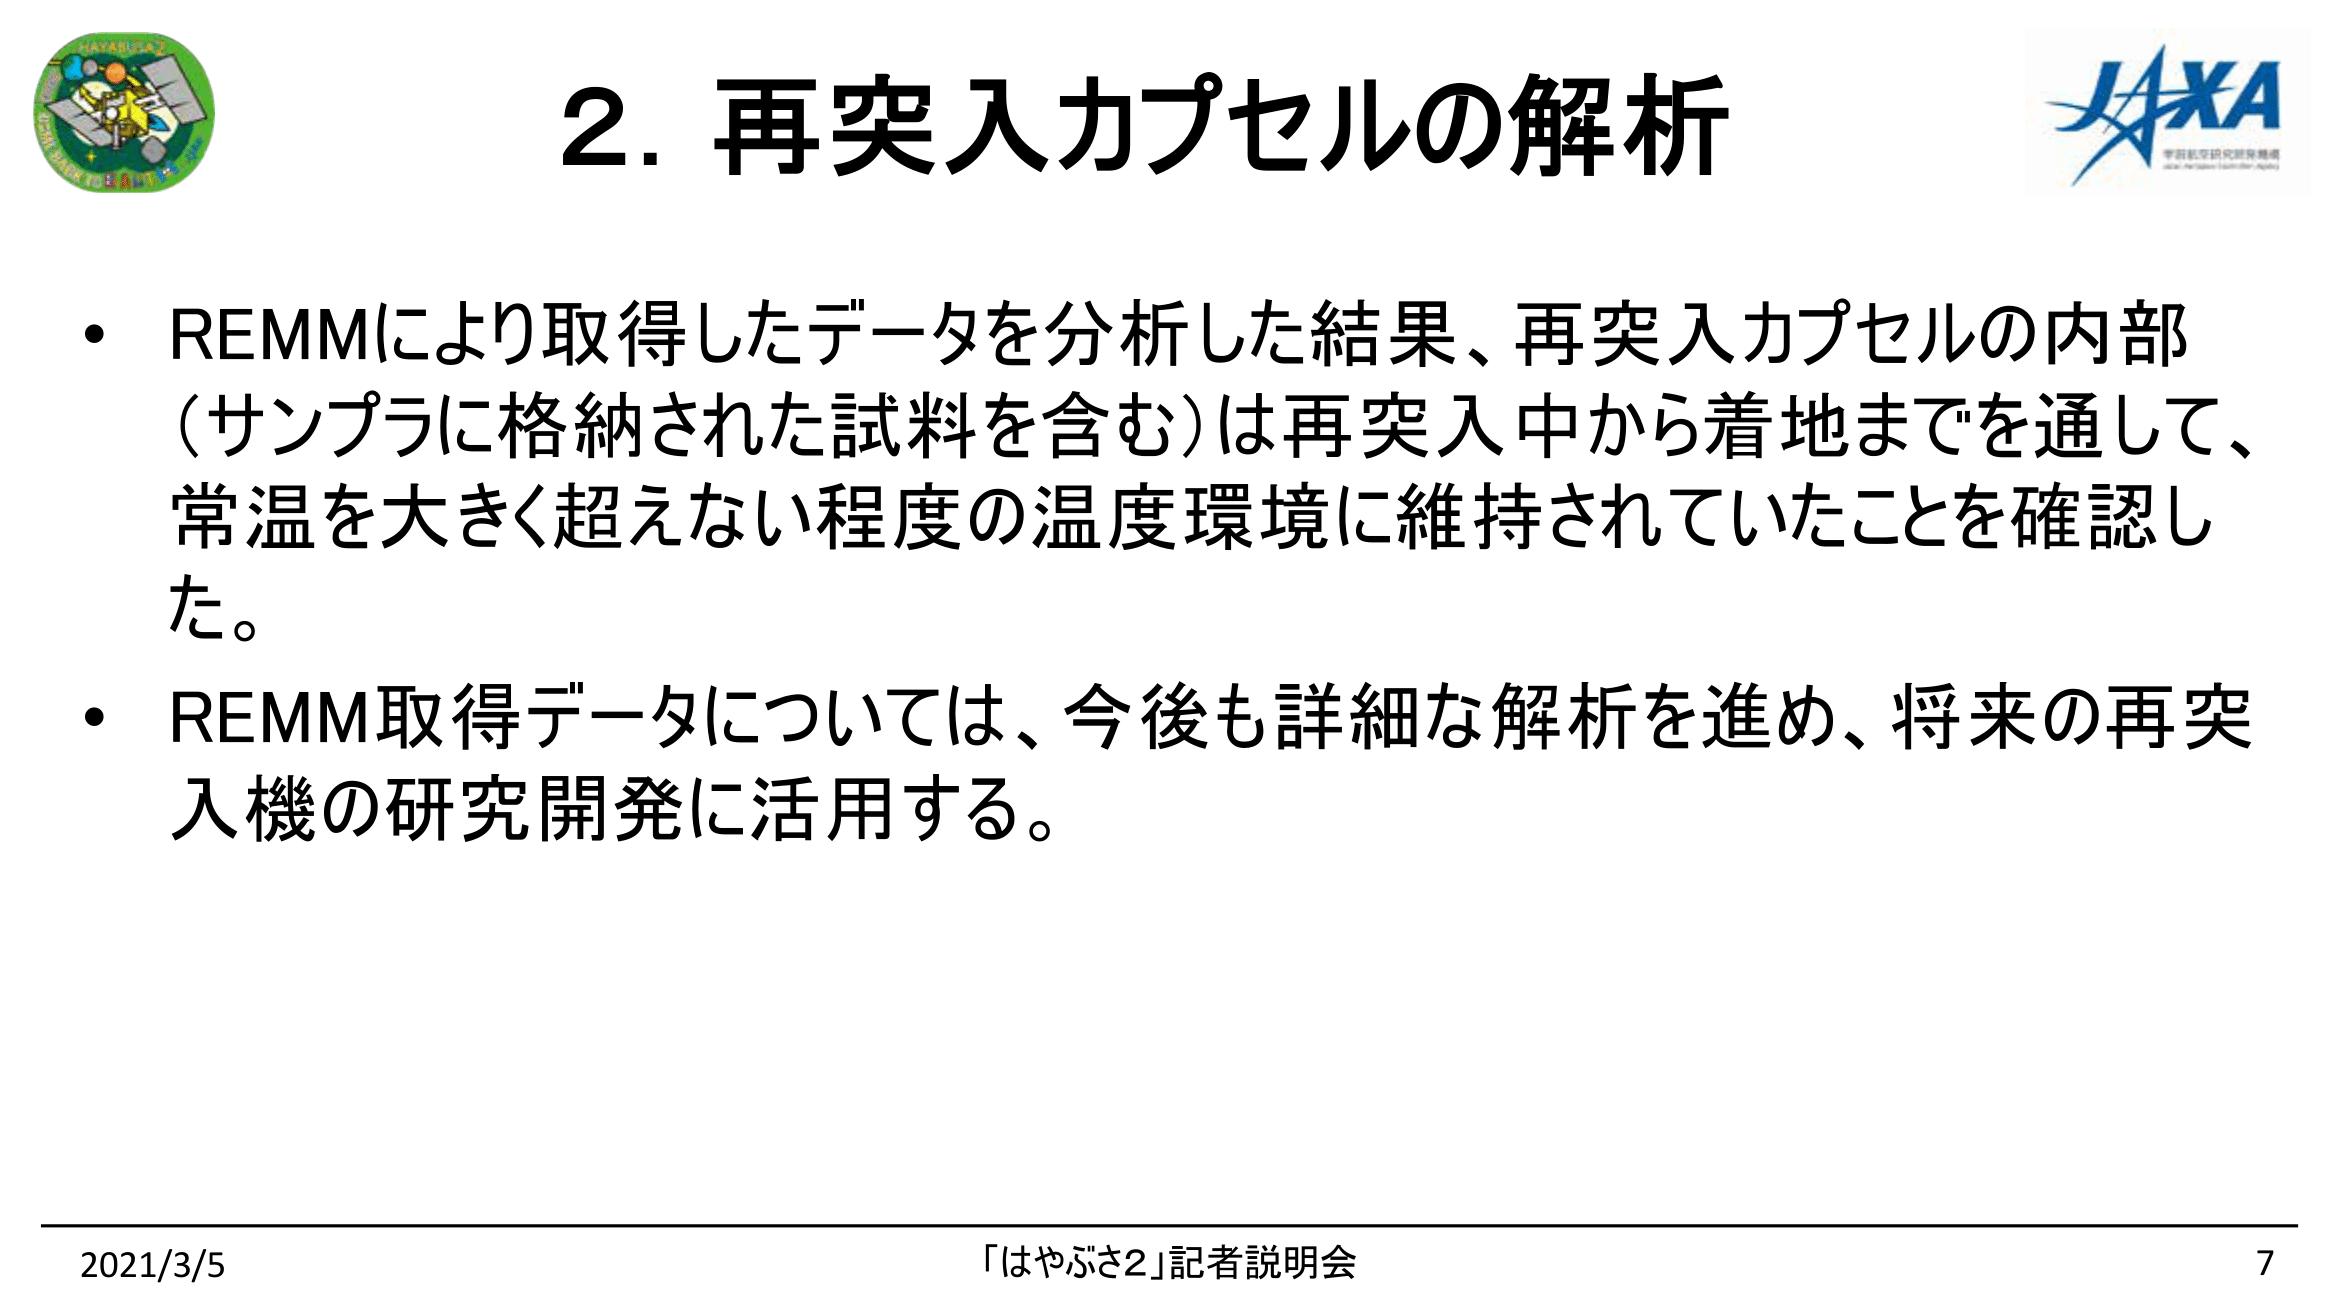 f:id:Imamura:20210305134114p:plain